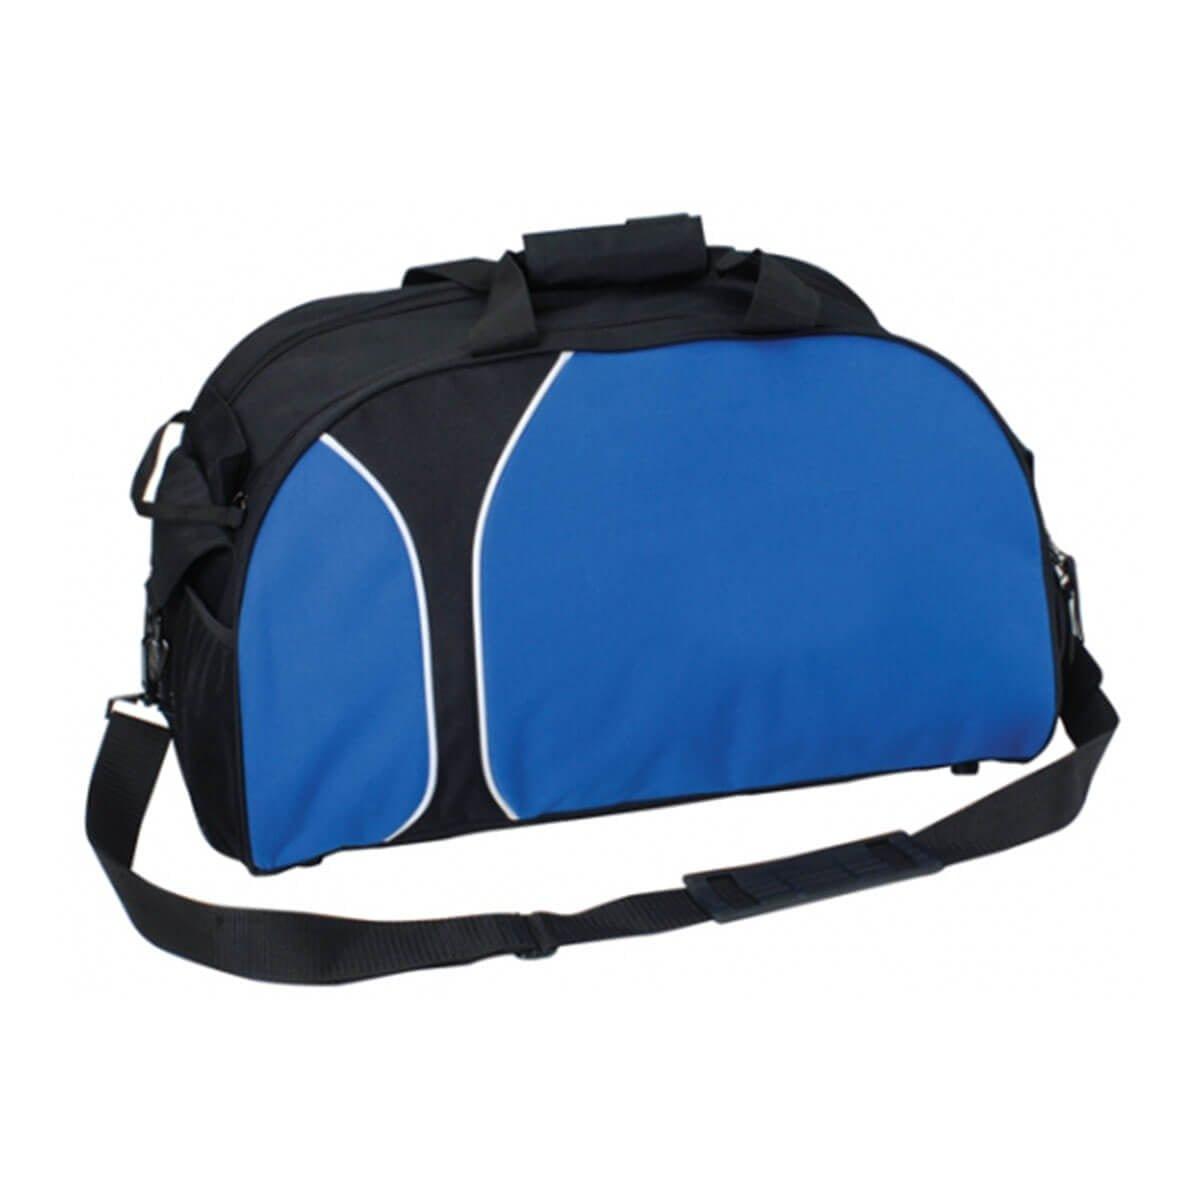 Travel Sports Bag-Black / Royal